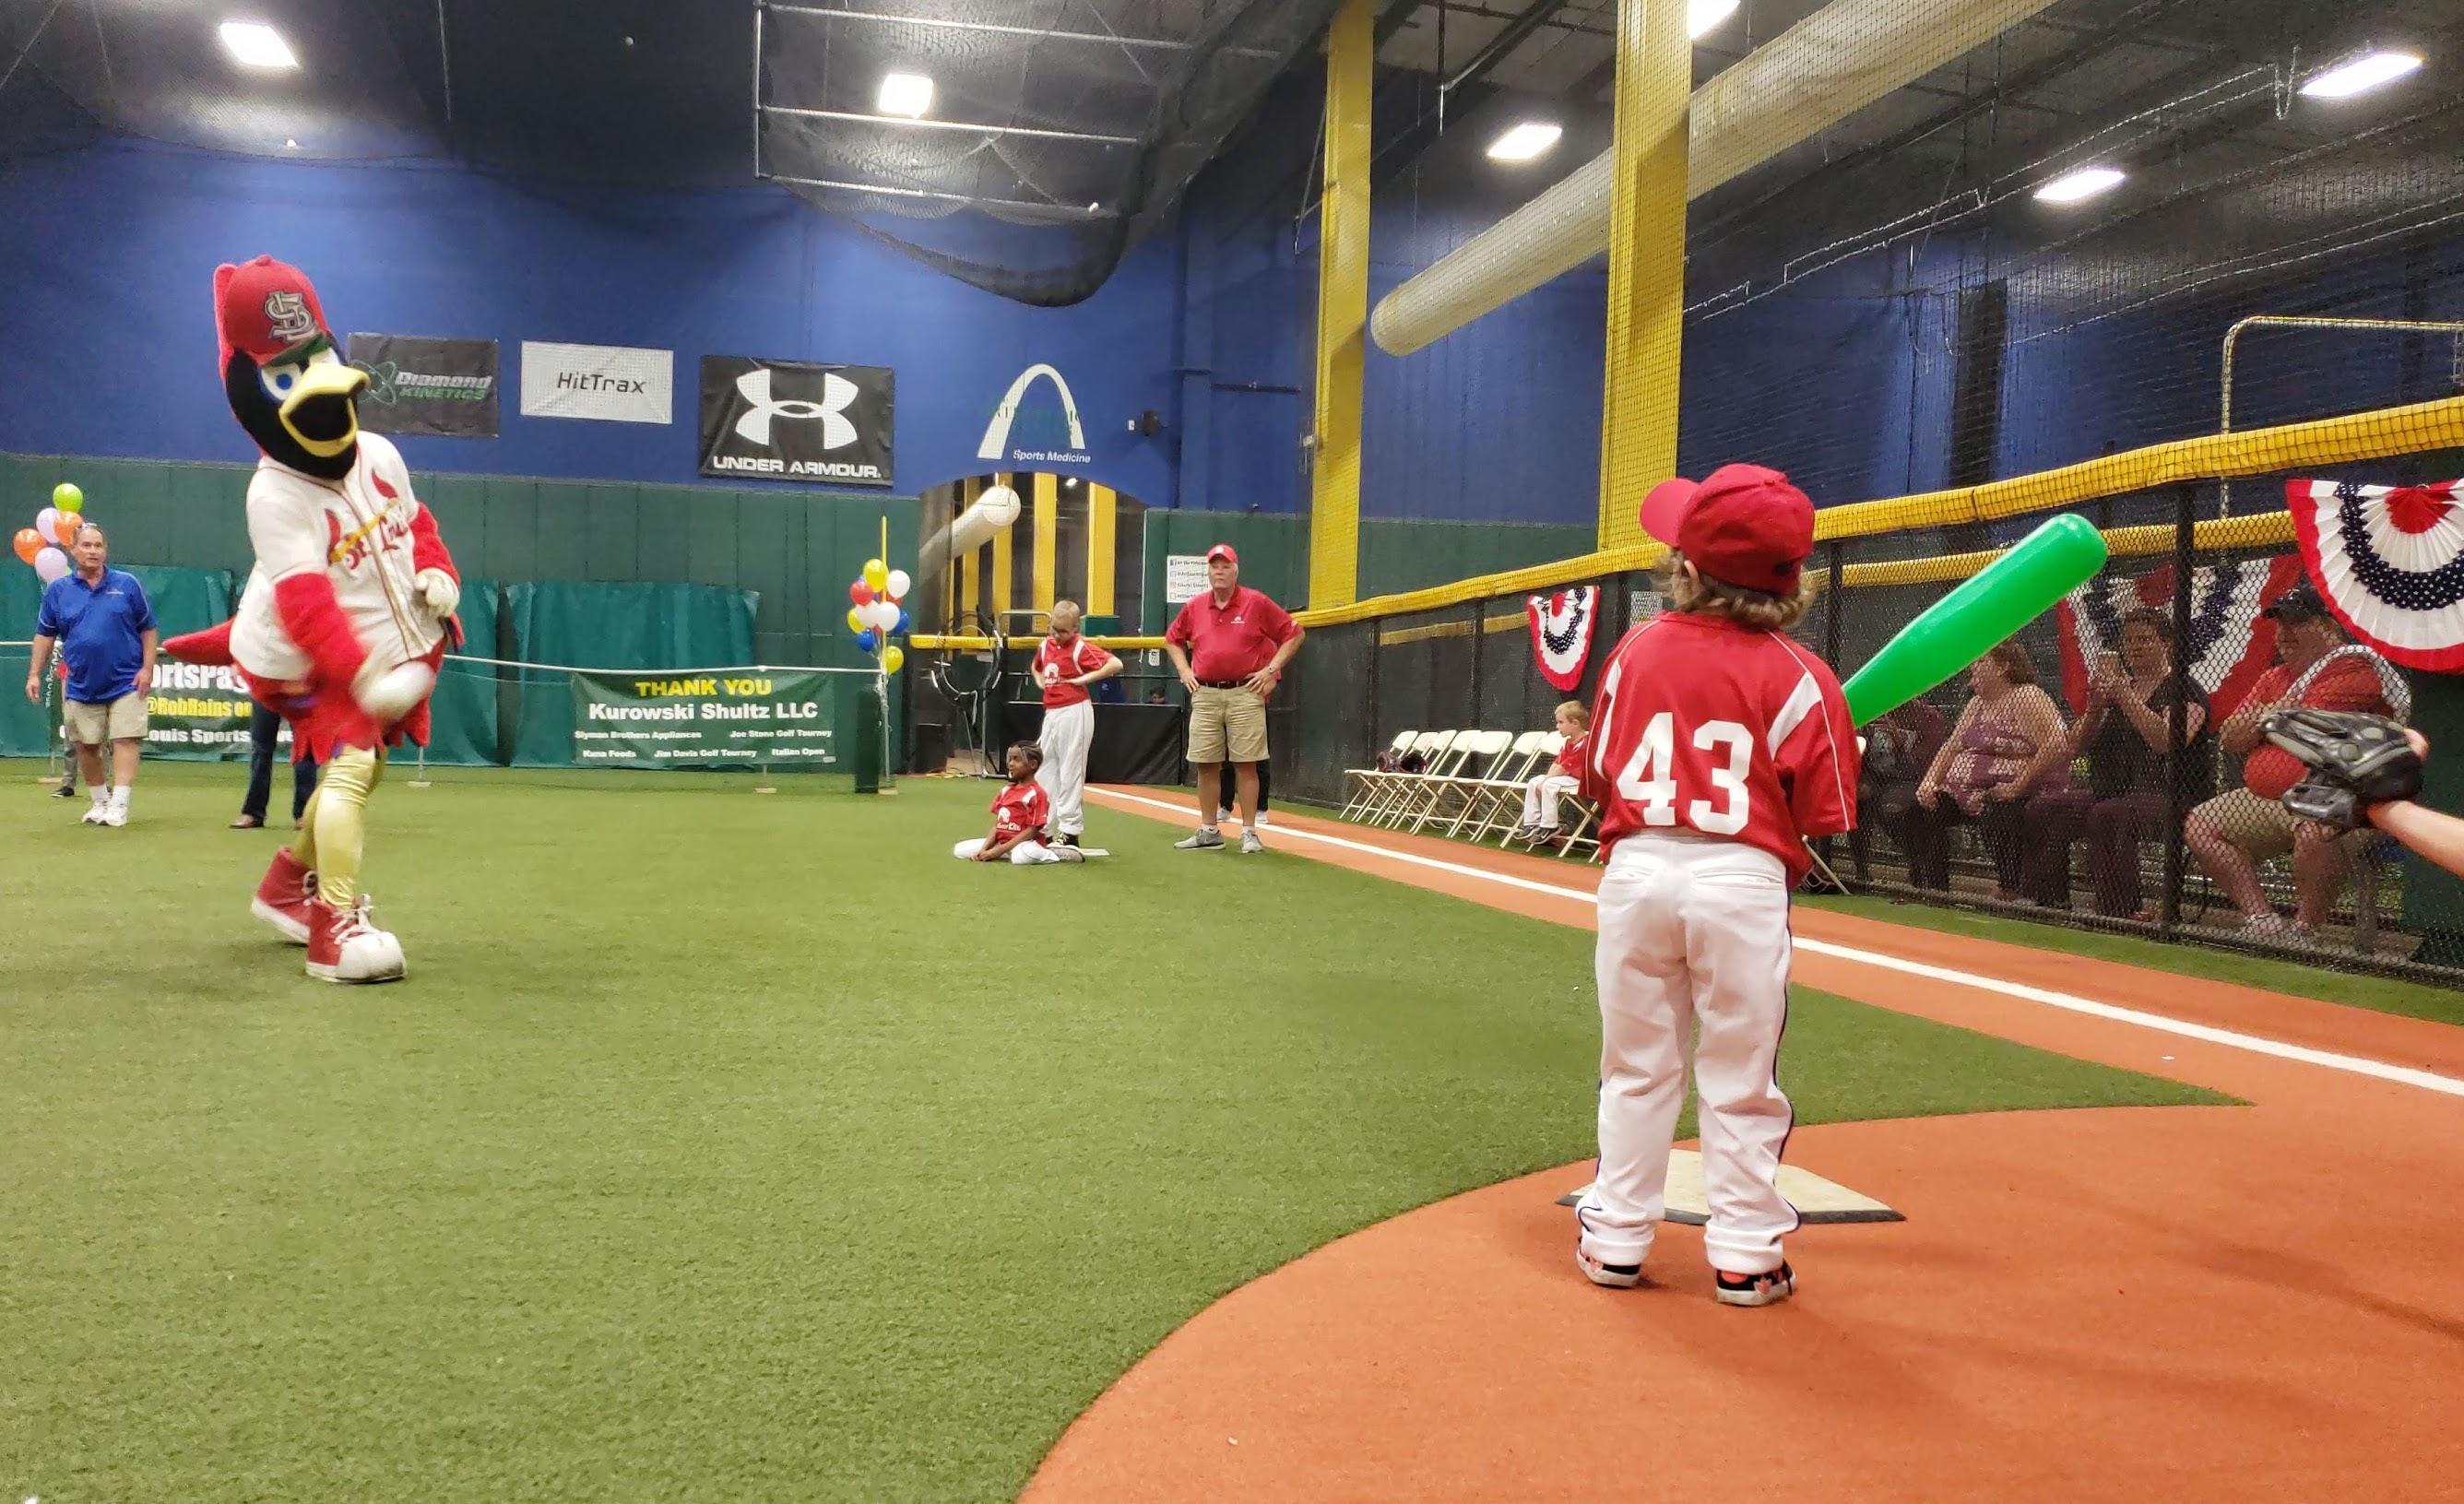 Fredbird pitching to child.jpg